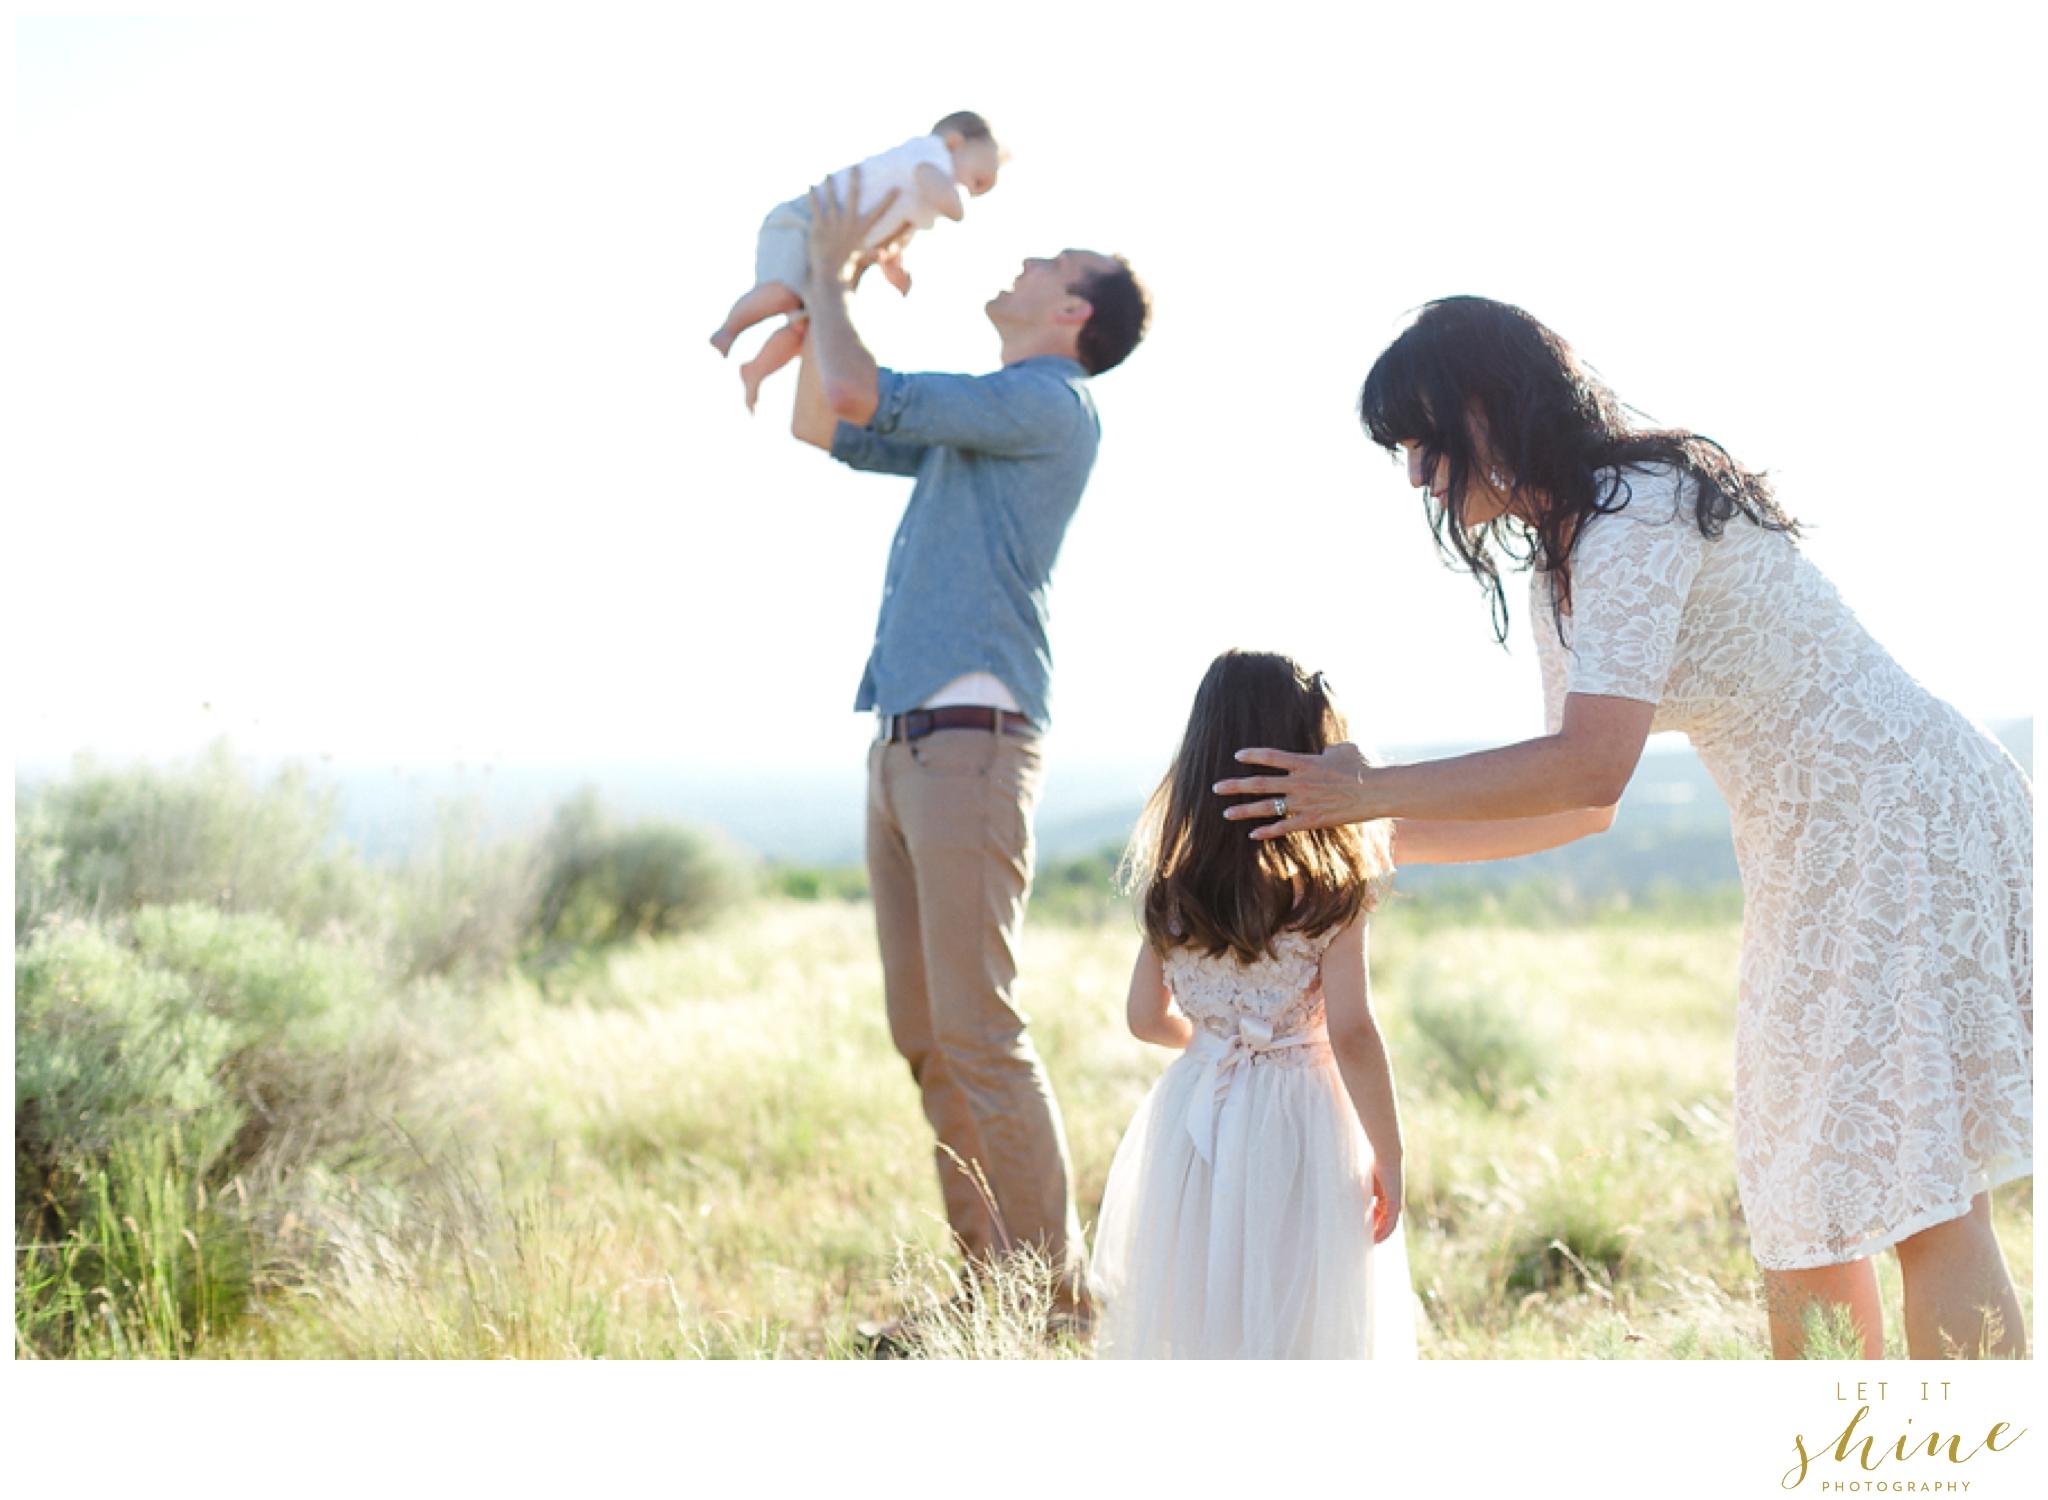 Boise Lifestyle Family Photographer-6200.jpg